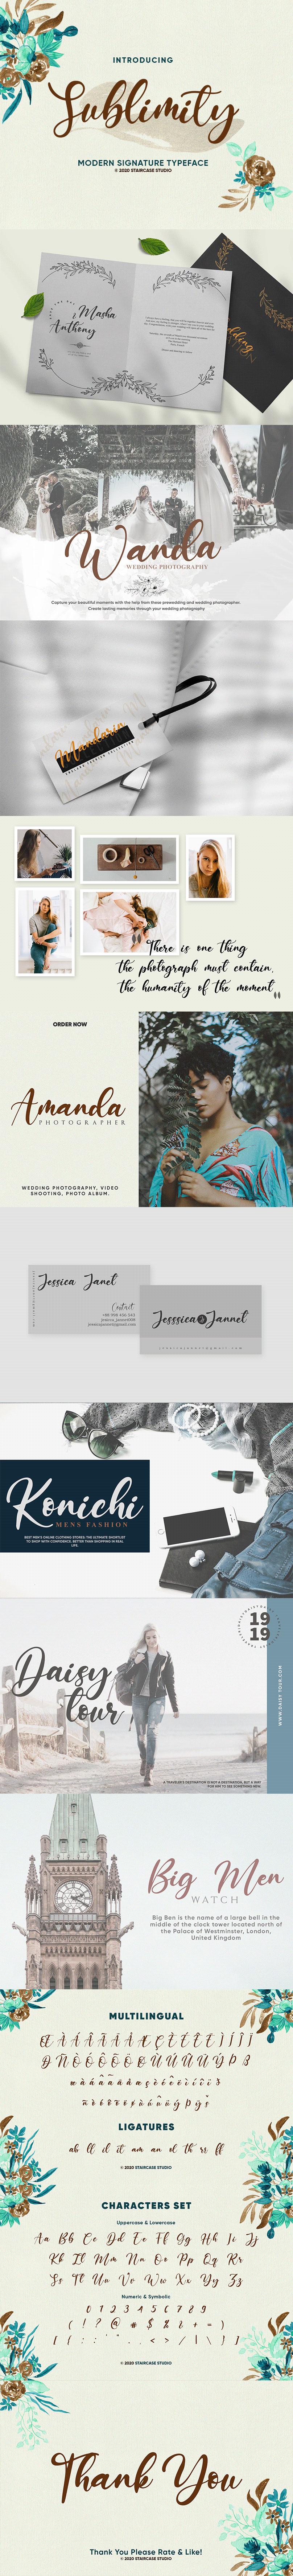 Birthday branding  font fonts Invitation modern Script signature Sublimity wedding